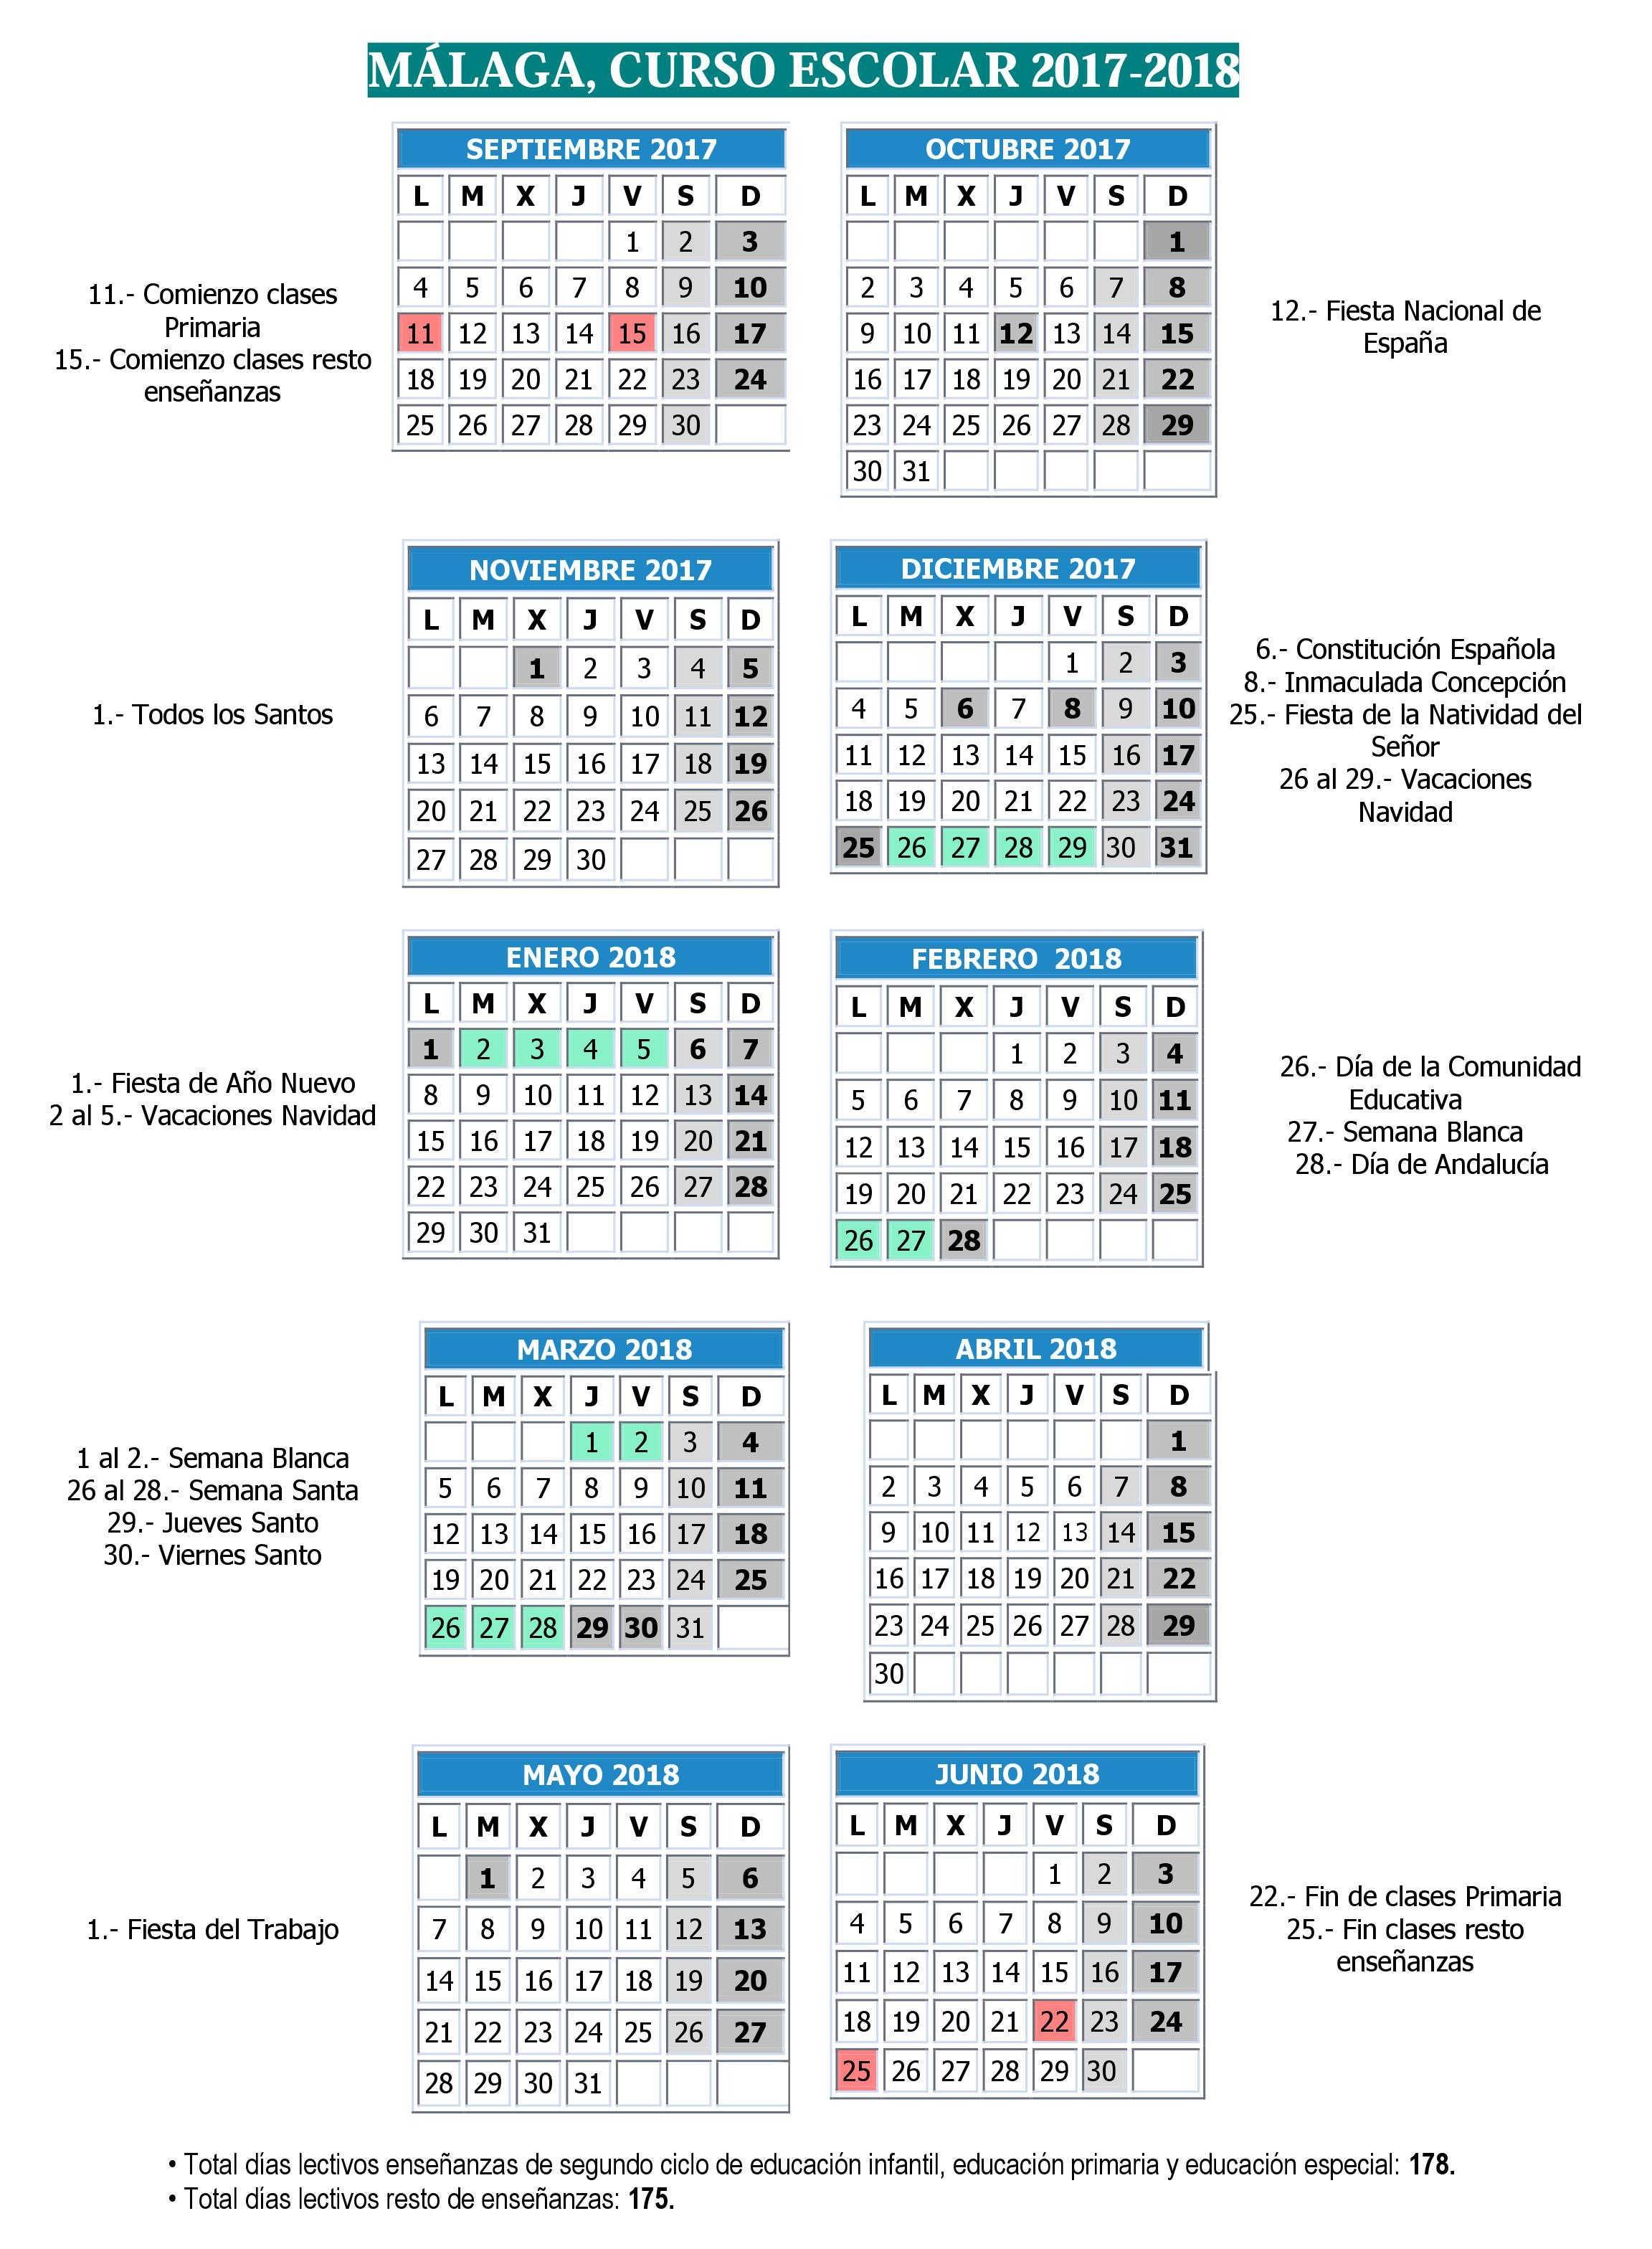 Calendario Escolar 2019 Descargar Más Actual Calendario Escolar Málaga 2017 2018 La Diversiva Gua De Ocio Of Calendario Escolar 2019 Descargar Recientes Calendario Escolar 2017 2018 Más De 100 Imágenes Para Descargar